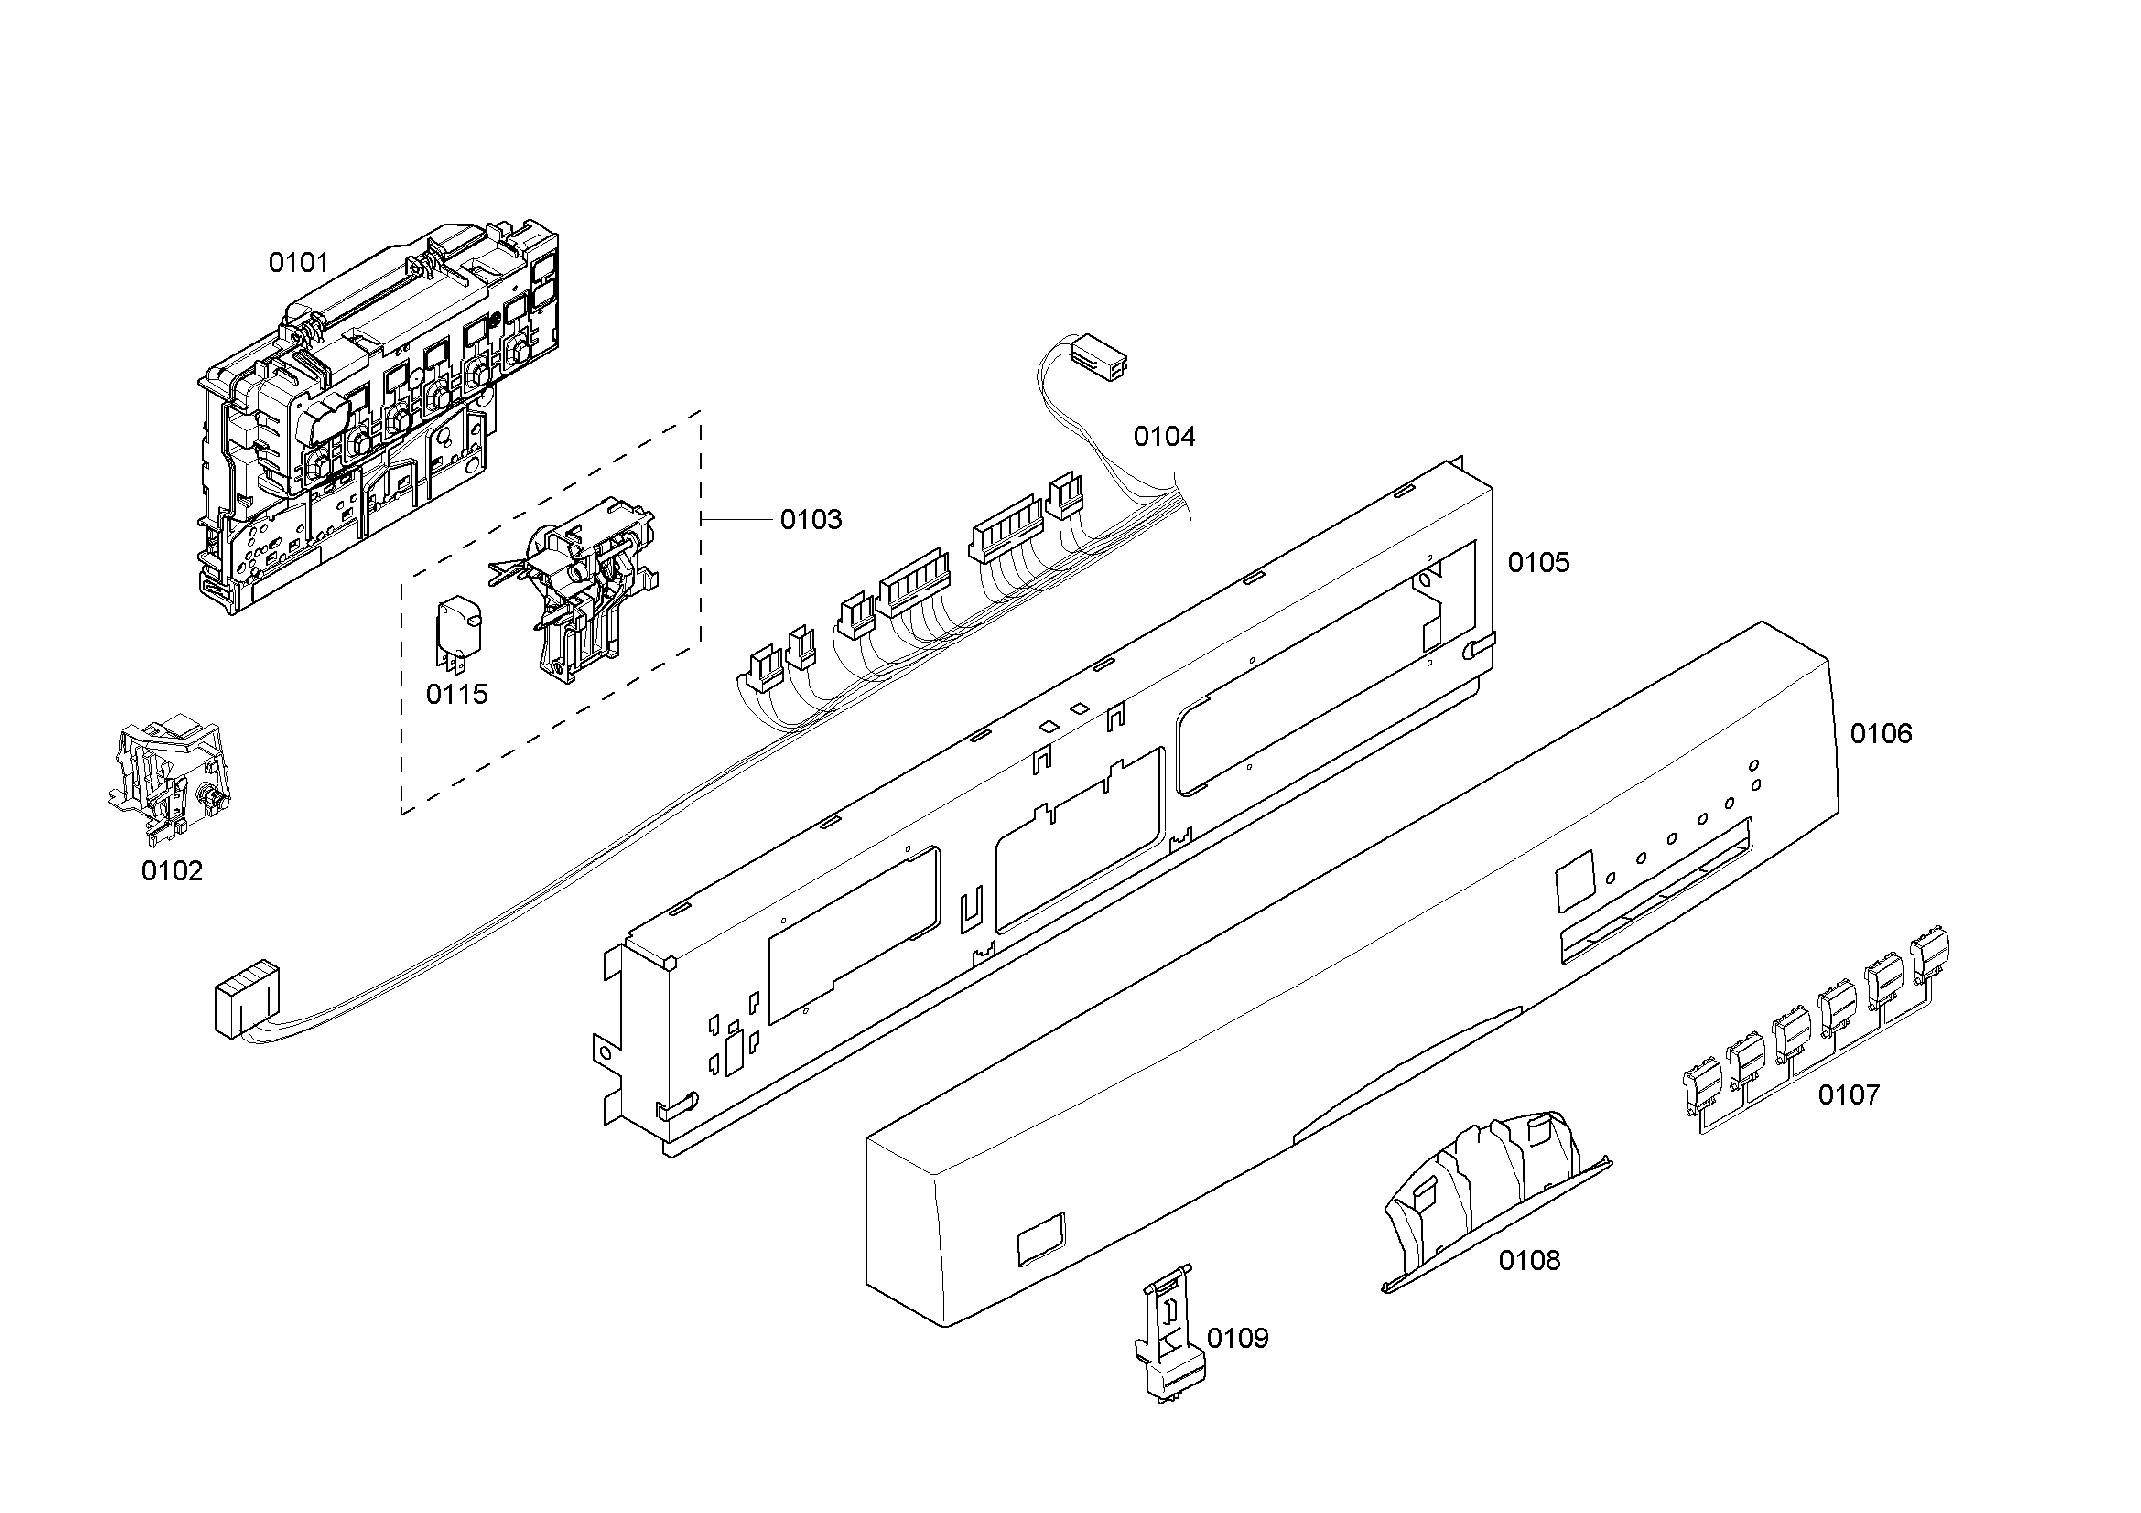 Bosch model SHE45M06UC/50 dishwasher genuine parts